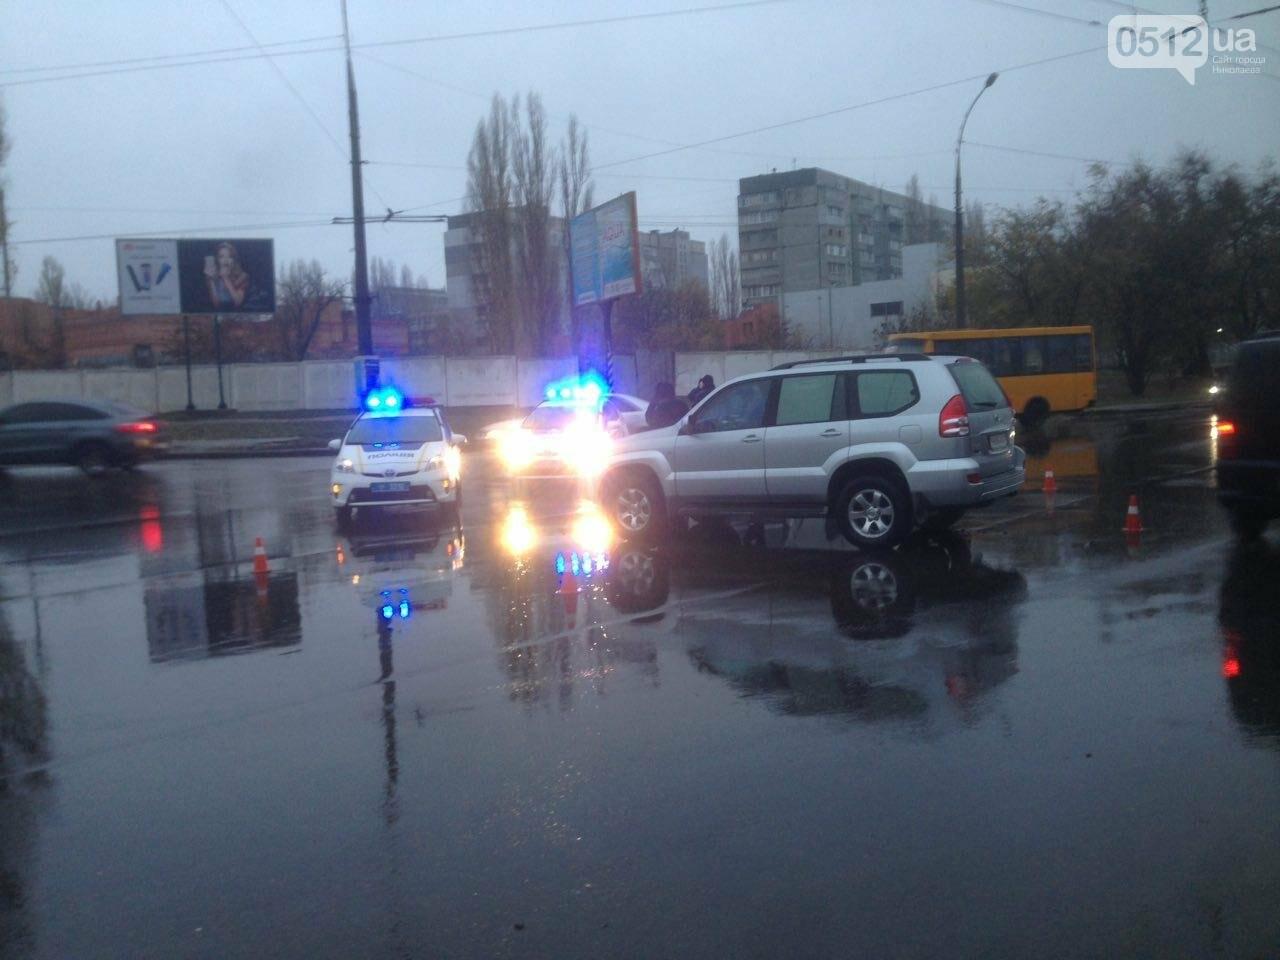 Возле спортшколы Надежда в Николаеве столкнулись Toyota и Subaru, - ФОТО , фото-7